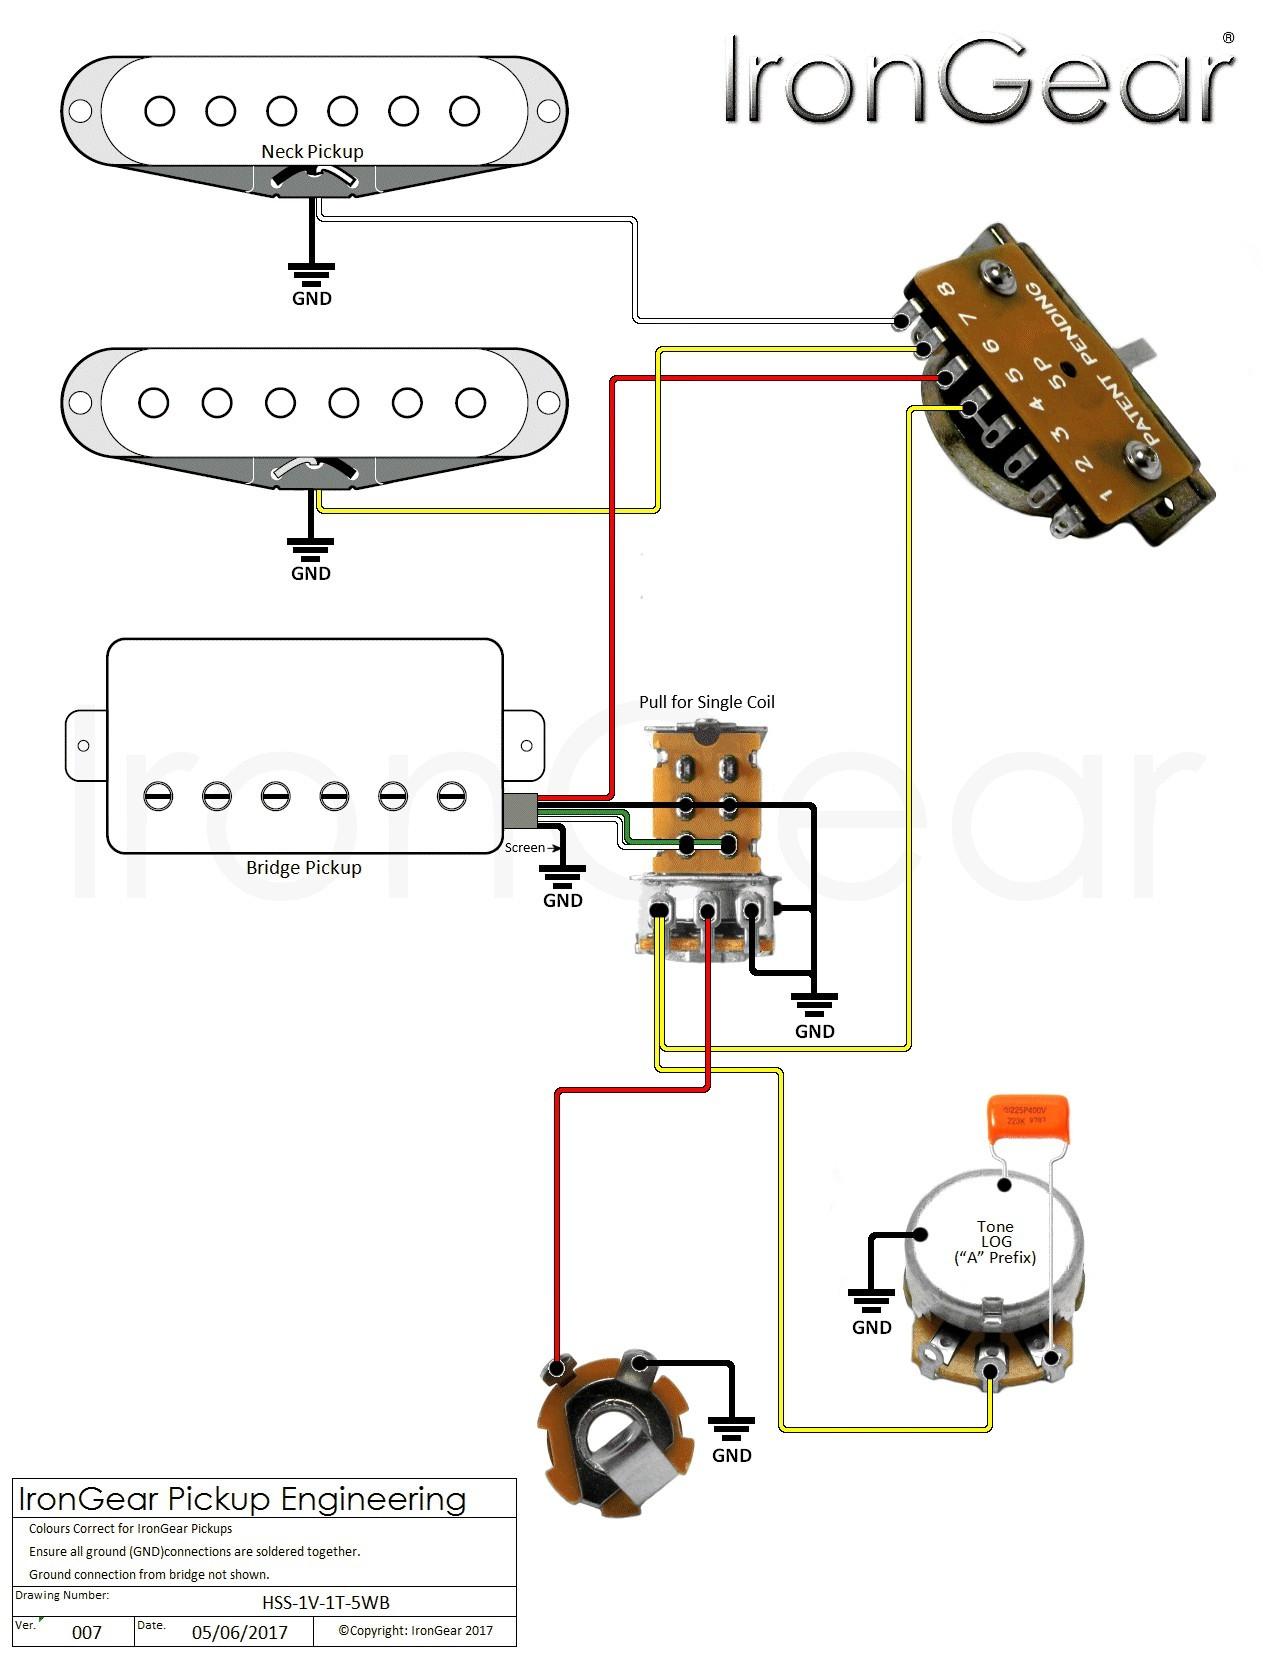 Pickup Wiring Diagram One Volume Tone Electrical Diagrams Kirk Hammett Emg Inspirational Image Irongear Pickups Guitar 2